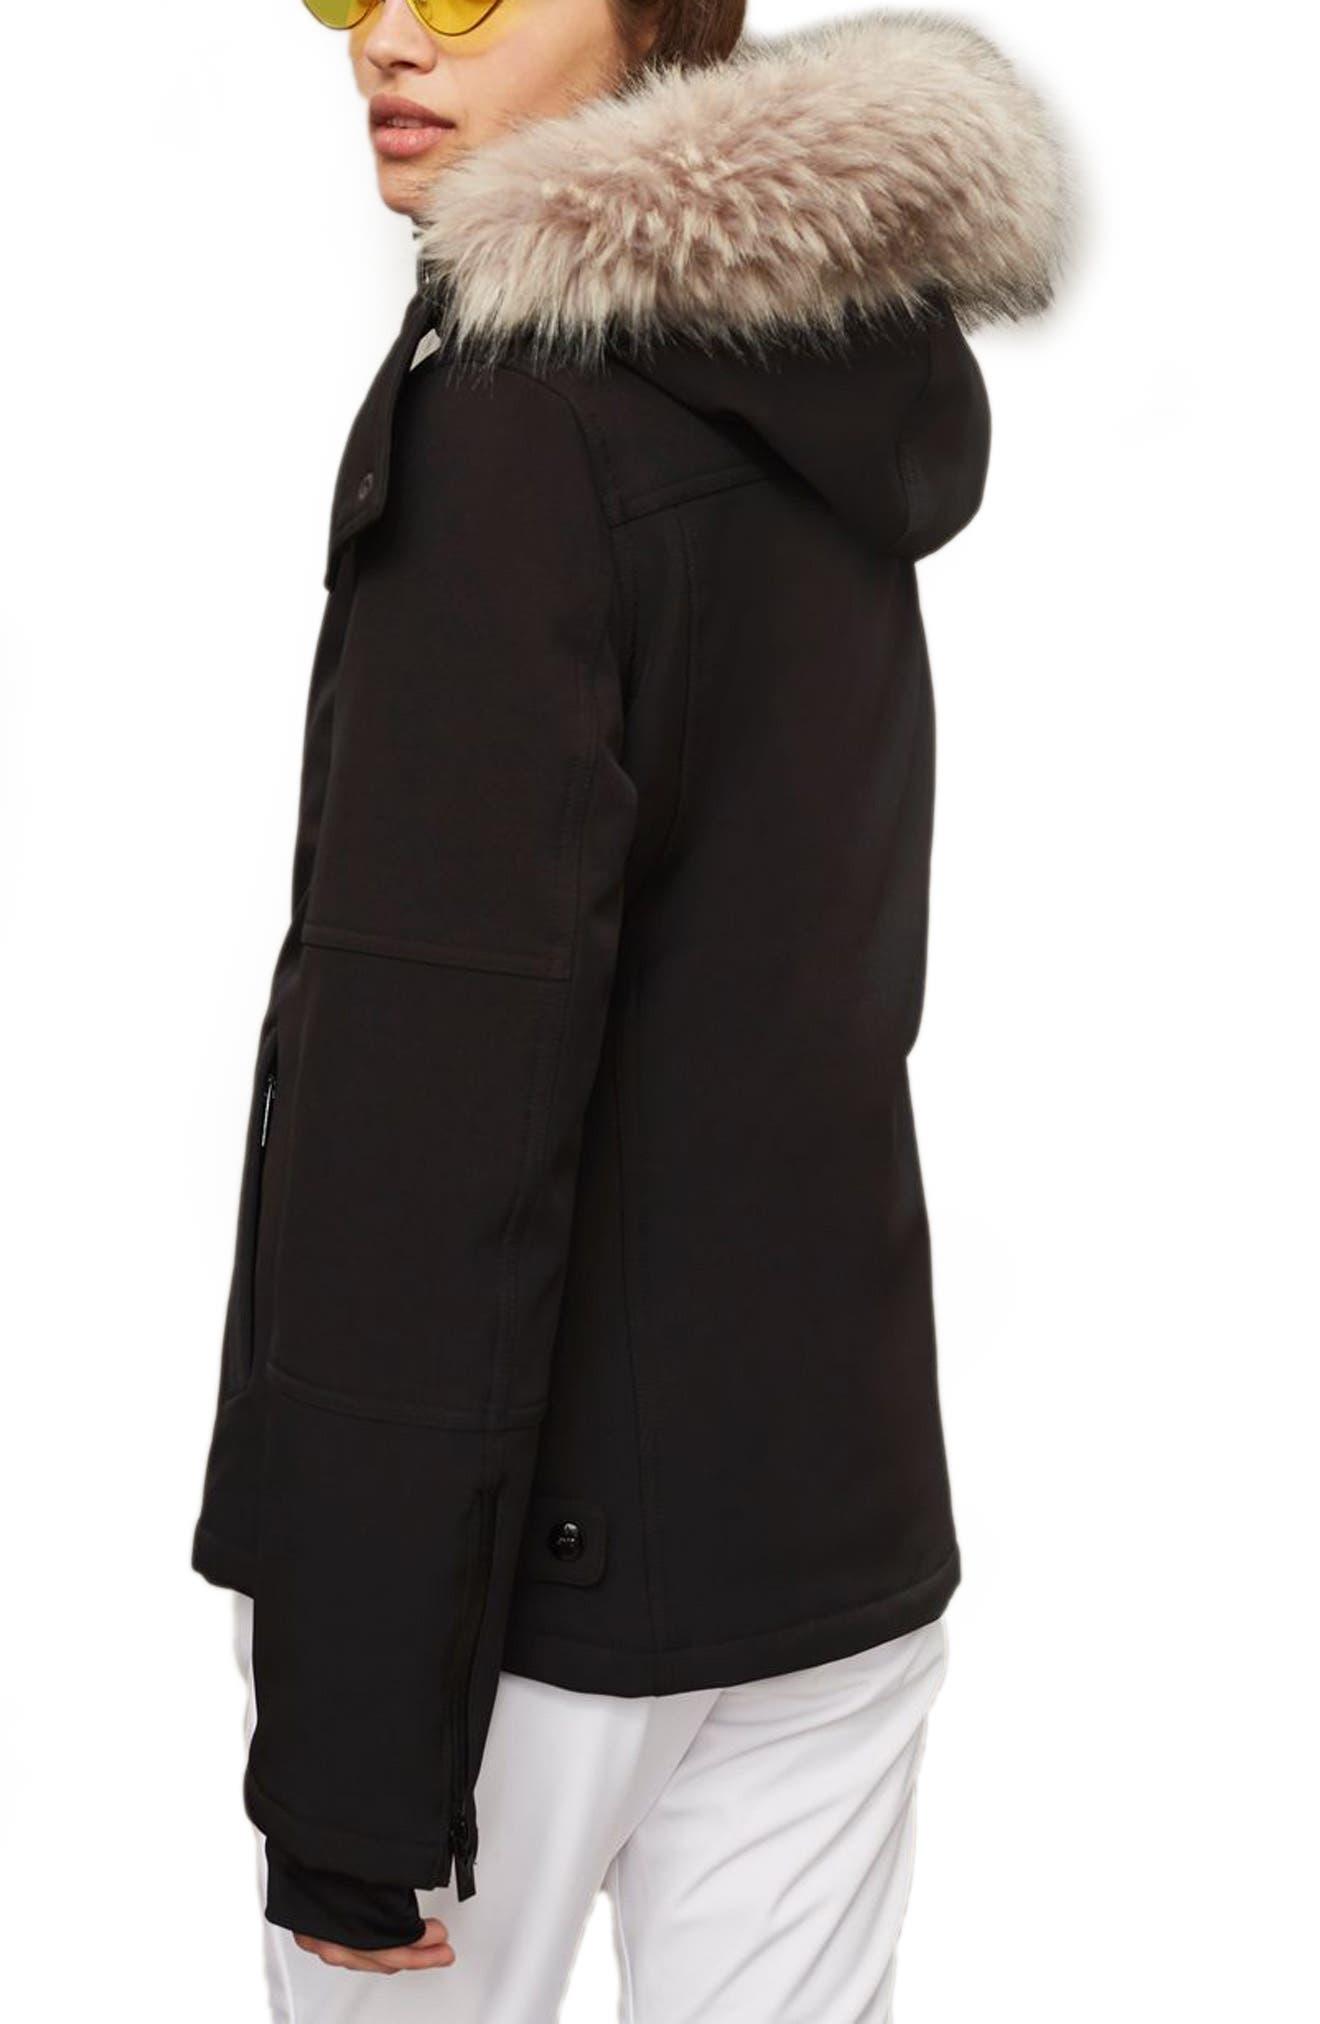 SNO Gladiator Faux Fur Hood Puffer Jacket,                             Alternate thumbnail 2, color,                             001